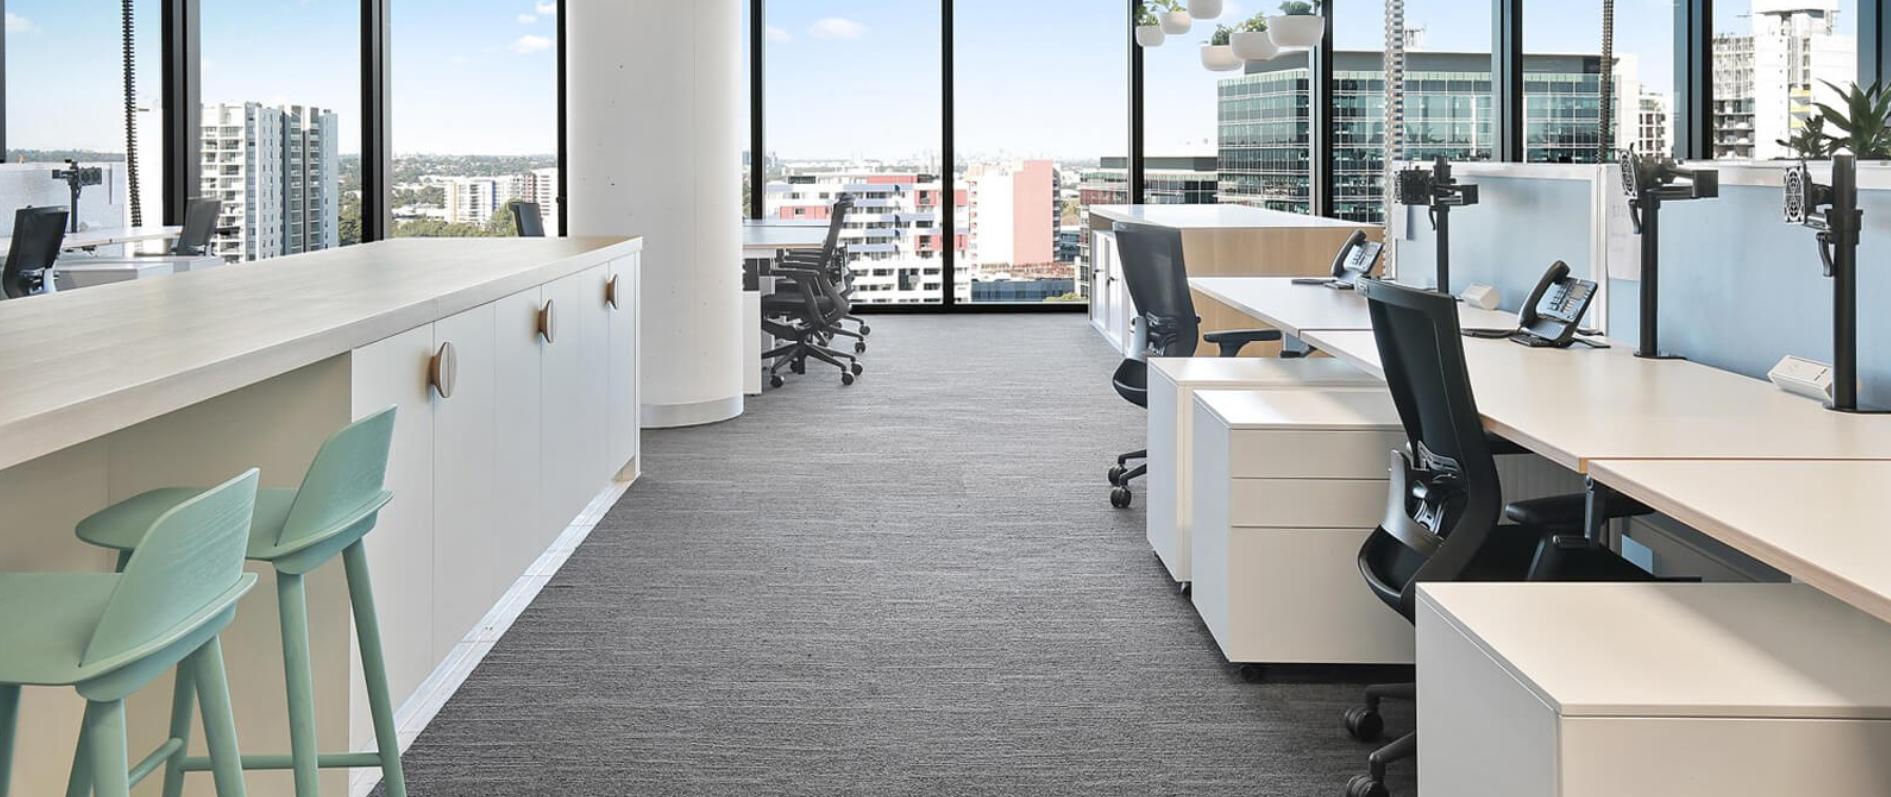 Manual Adjustable Desks With Fabric Screens